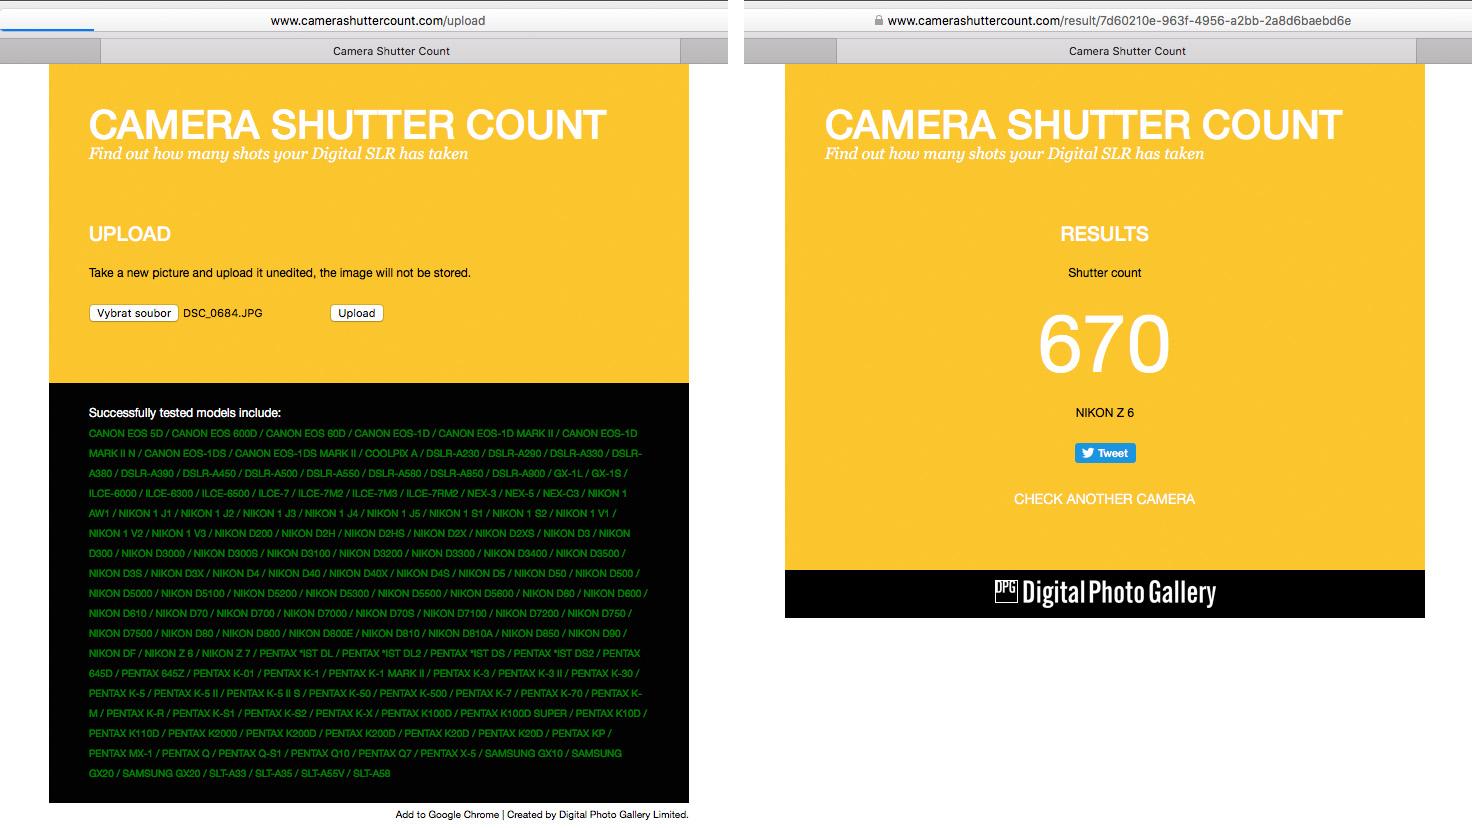 Camera Shutter Count